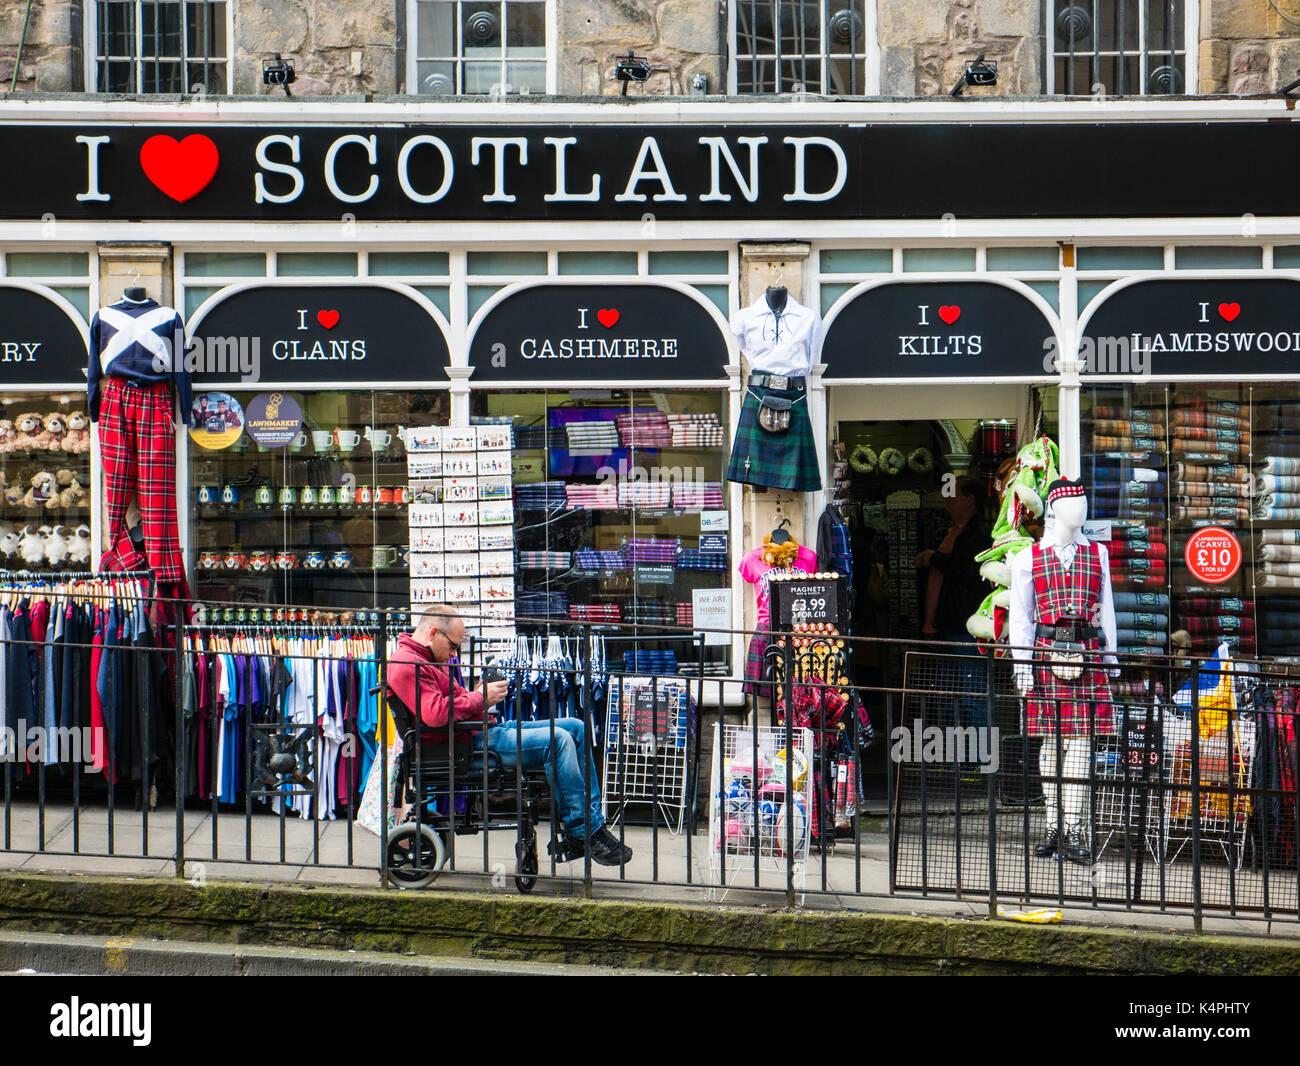 I Love Scotland, Tourist Shop, Edinburg, Scotland - Stock Image